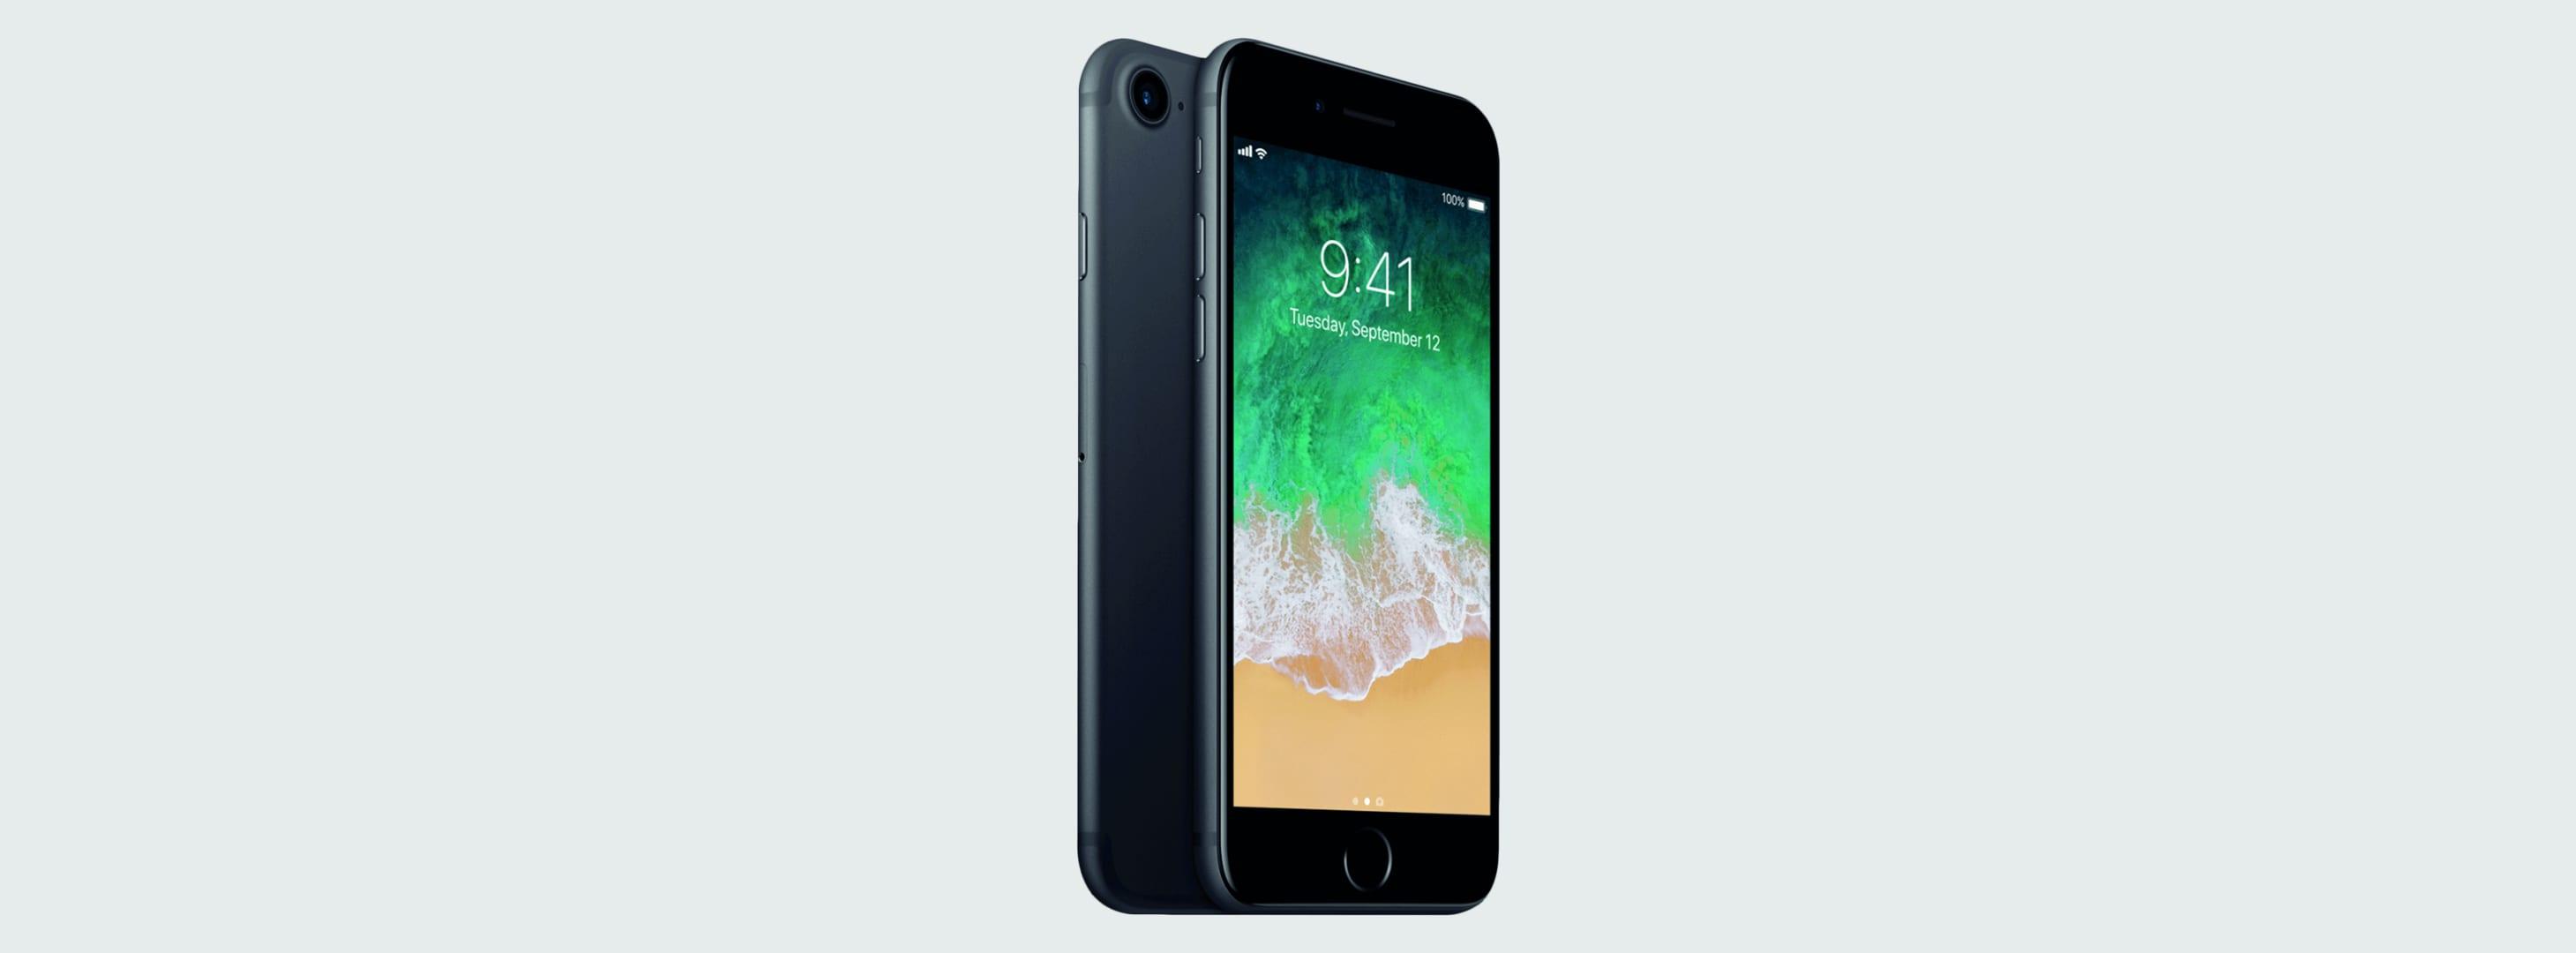 allapplenews-iphone-7-screen